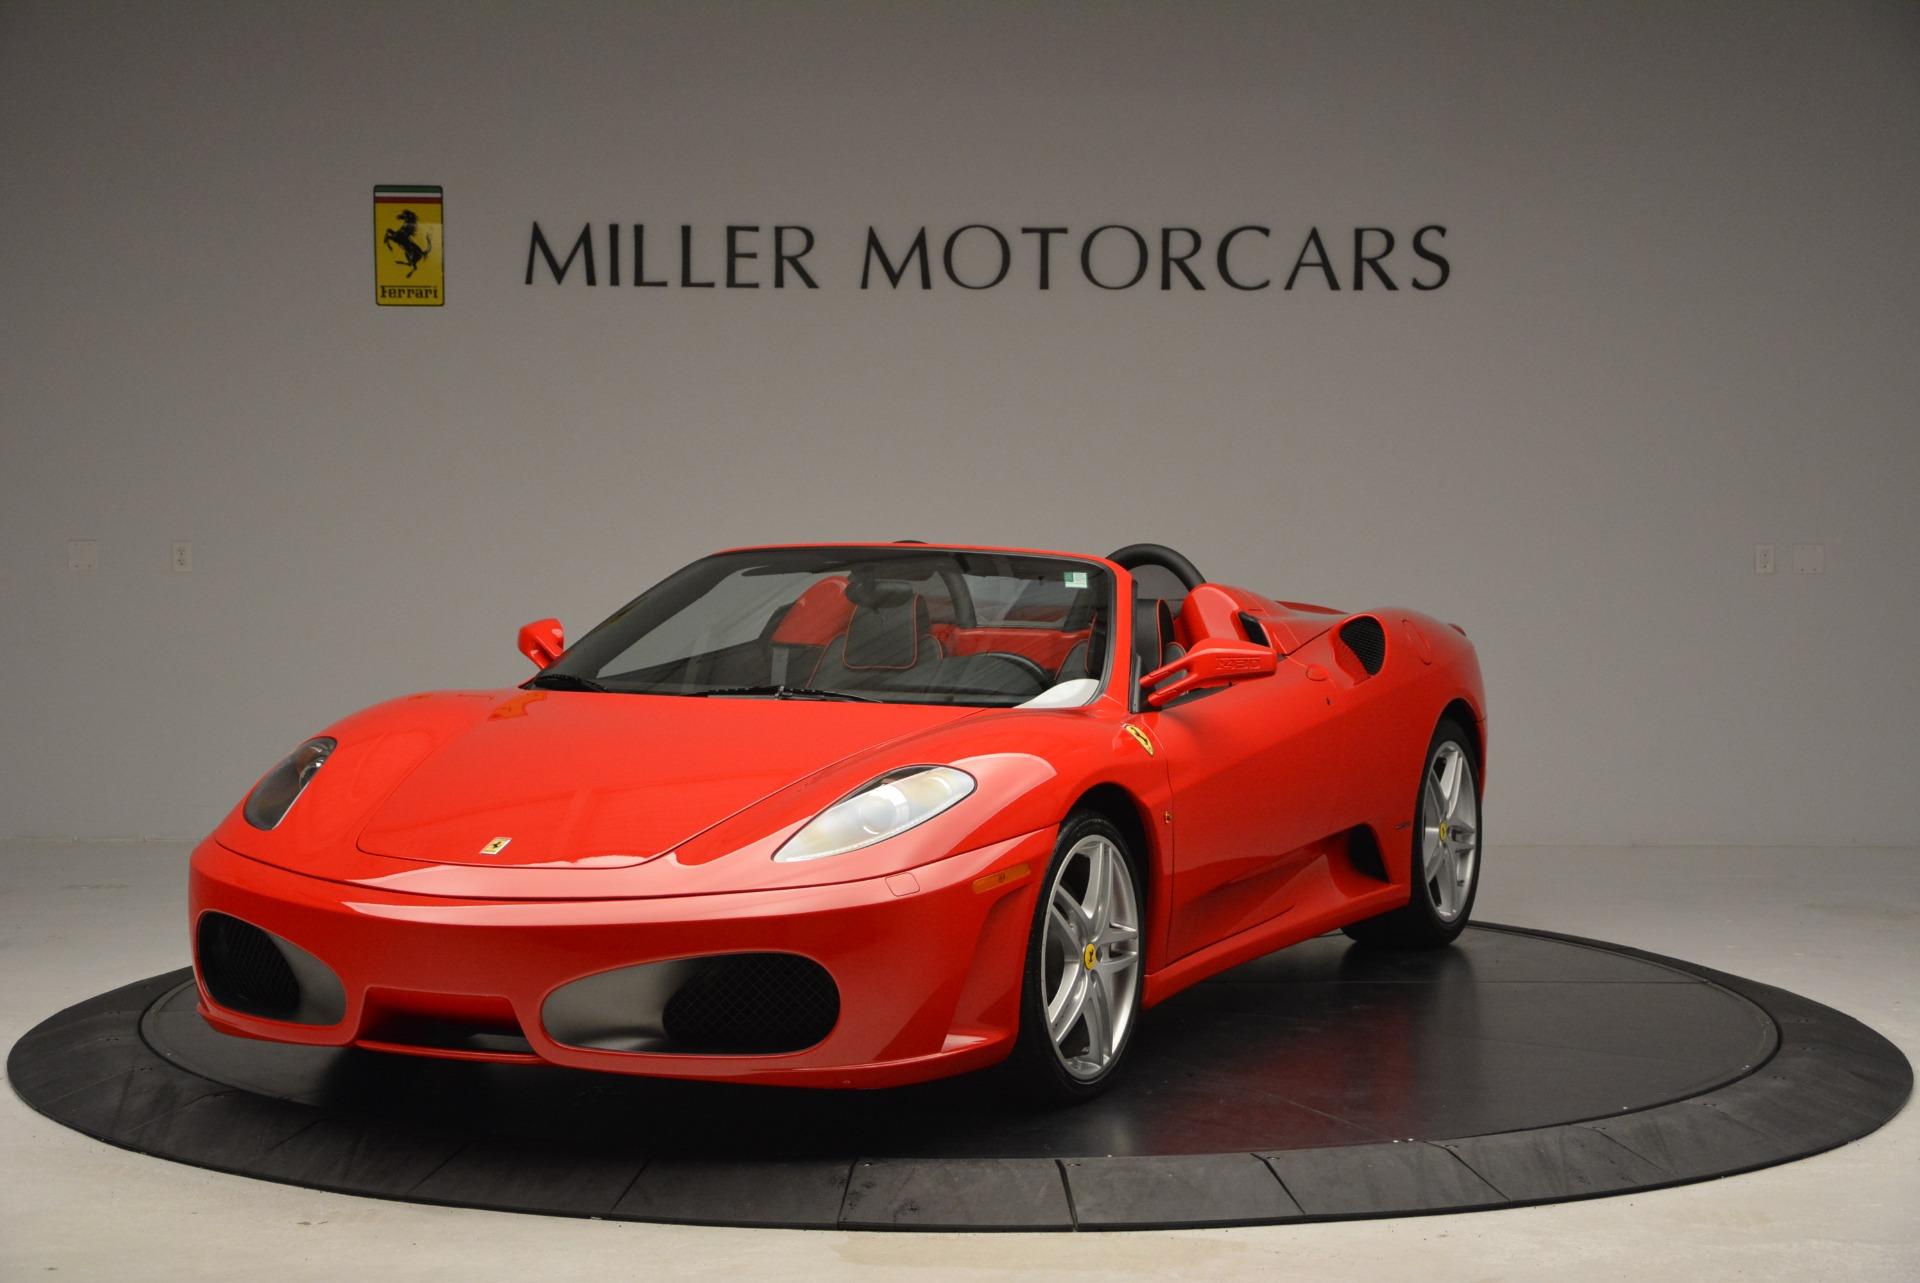 Used 2006 Ferrari F430 SPIDER F1 Spider for sale Sold at Aston Martin of Greenwich in Greenwich CT 06830 1